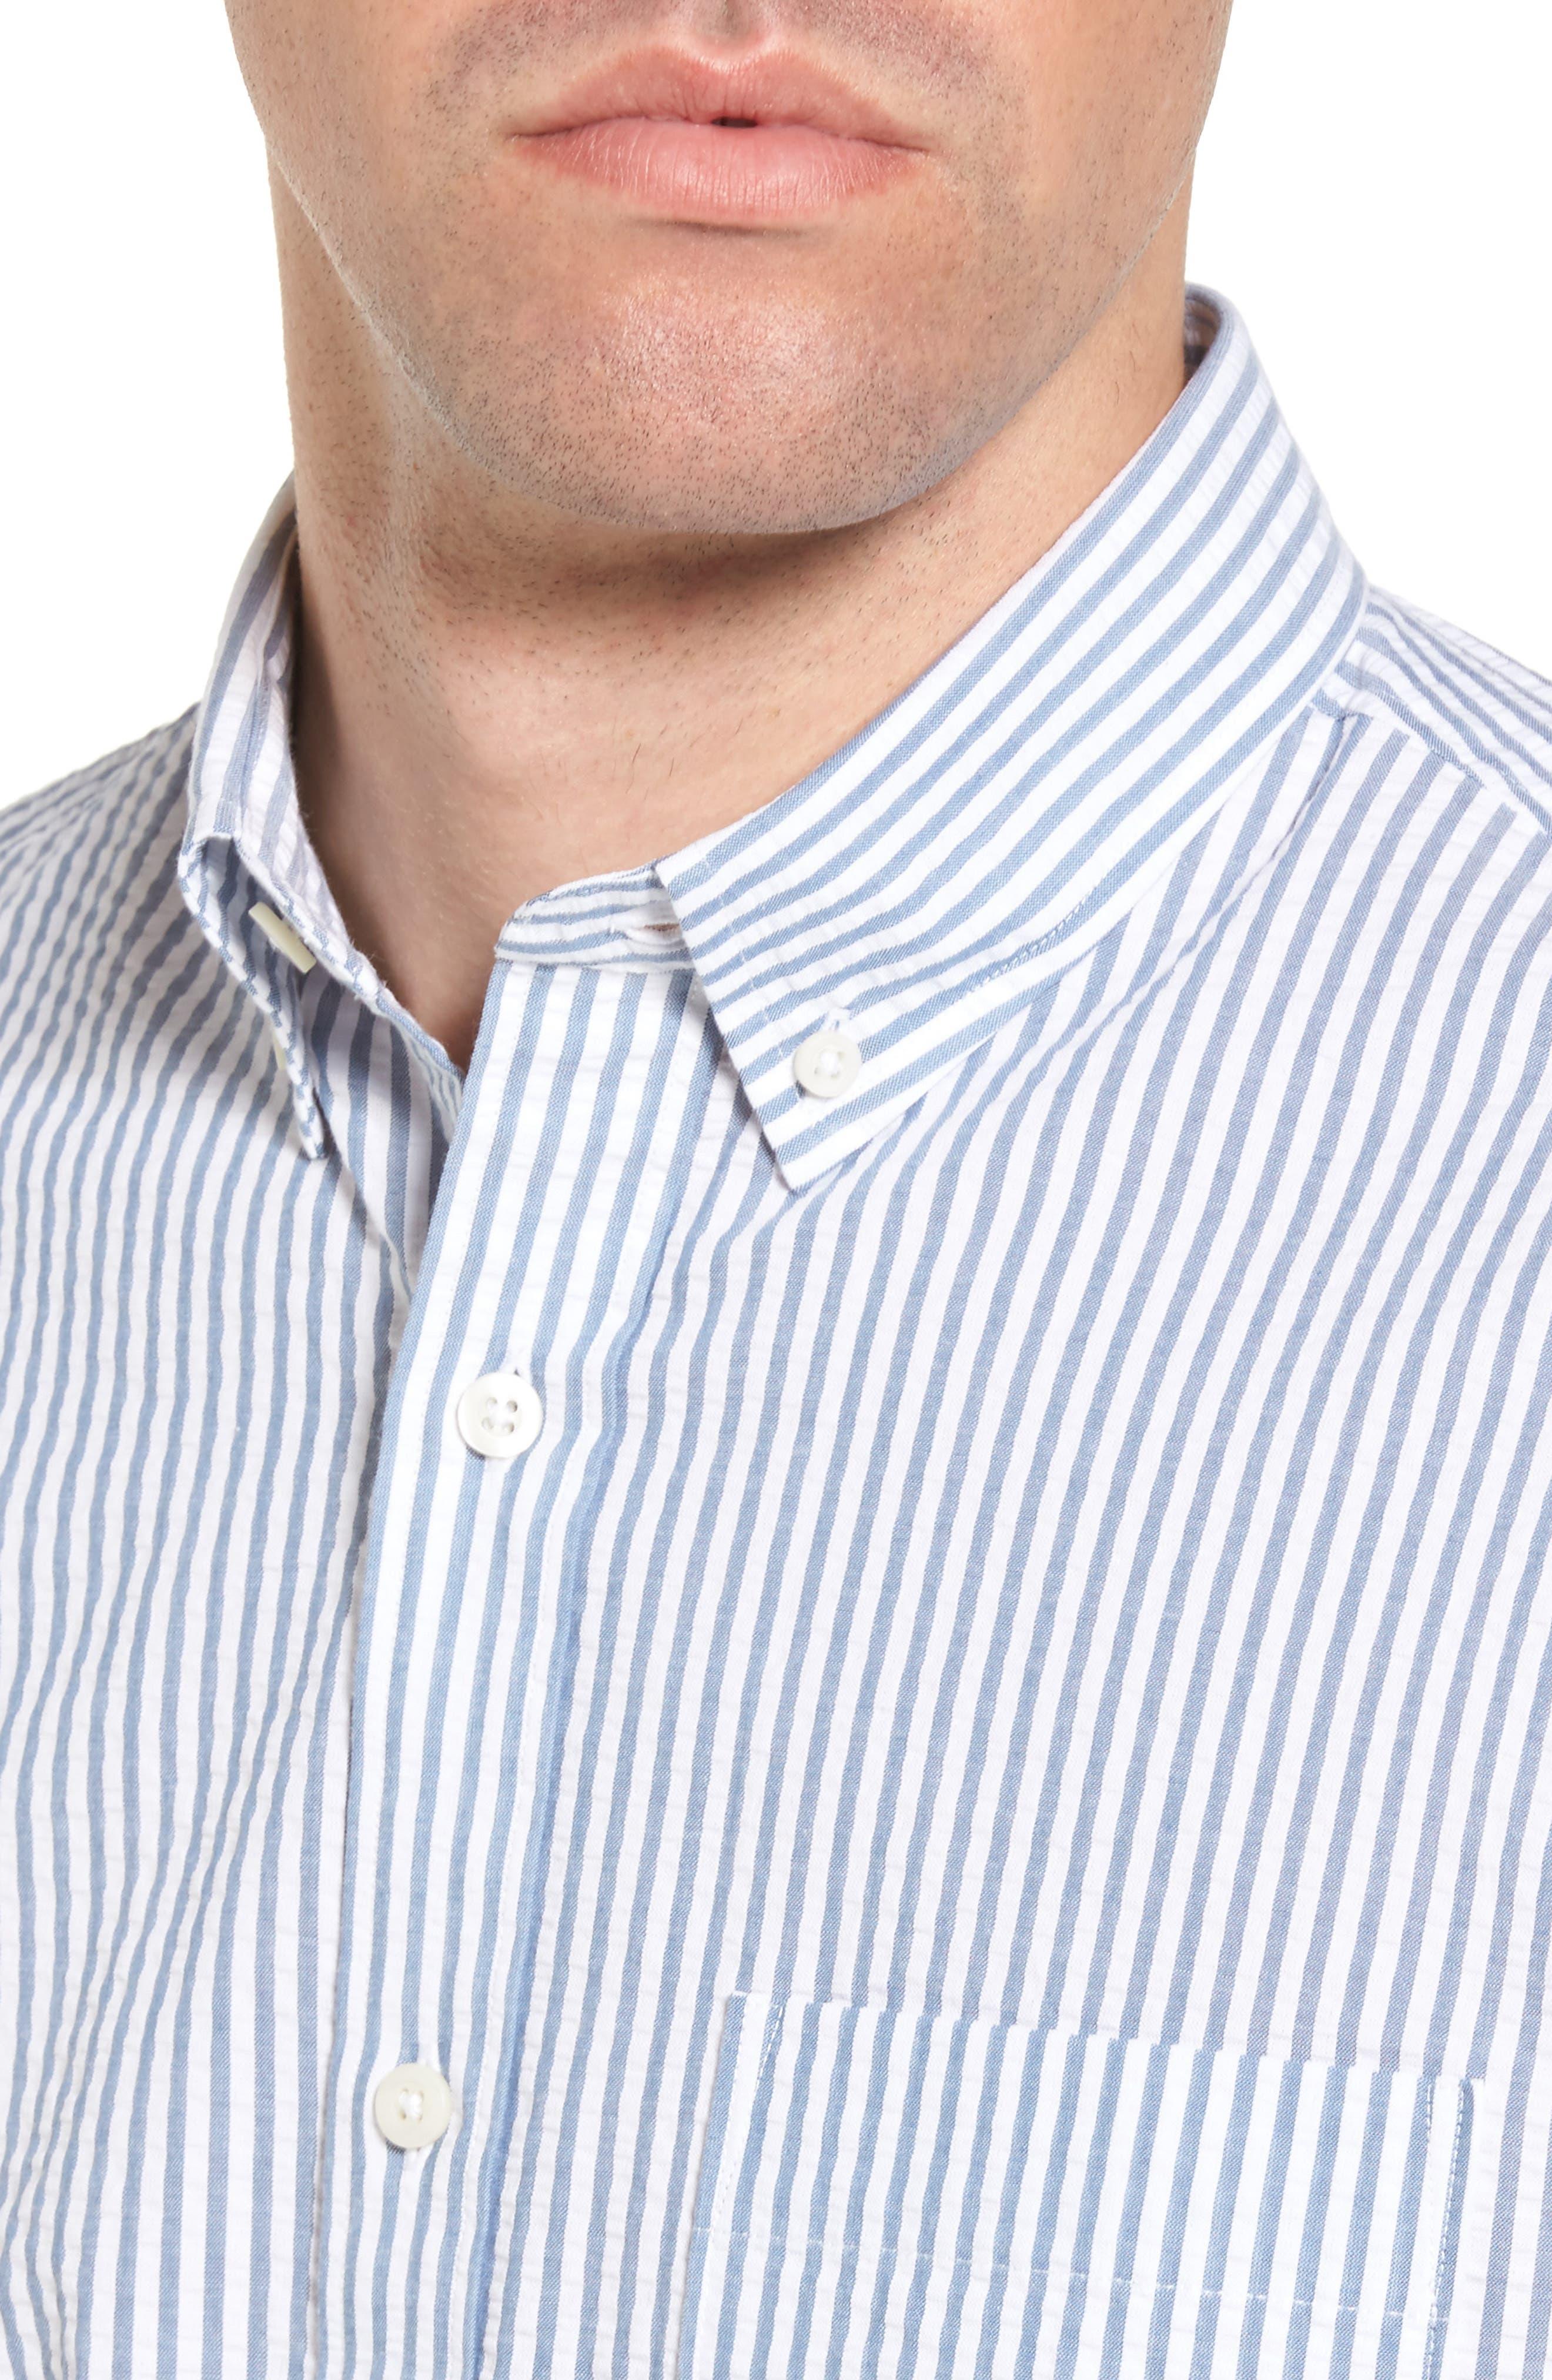 Trim Fit Seersucker Short Sleeve Sport Shirt,                             Alternate thumbnail 2, color,                             White Navy Seersucker Stripe